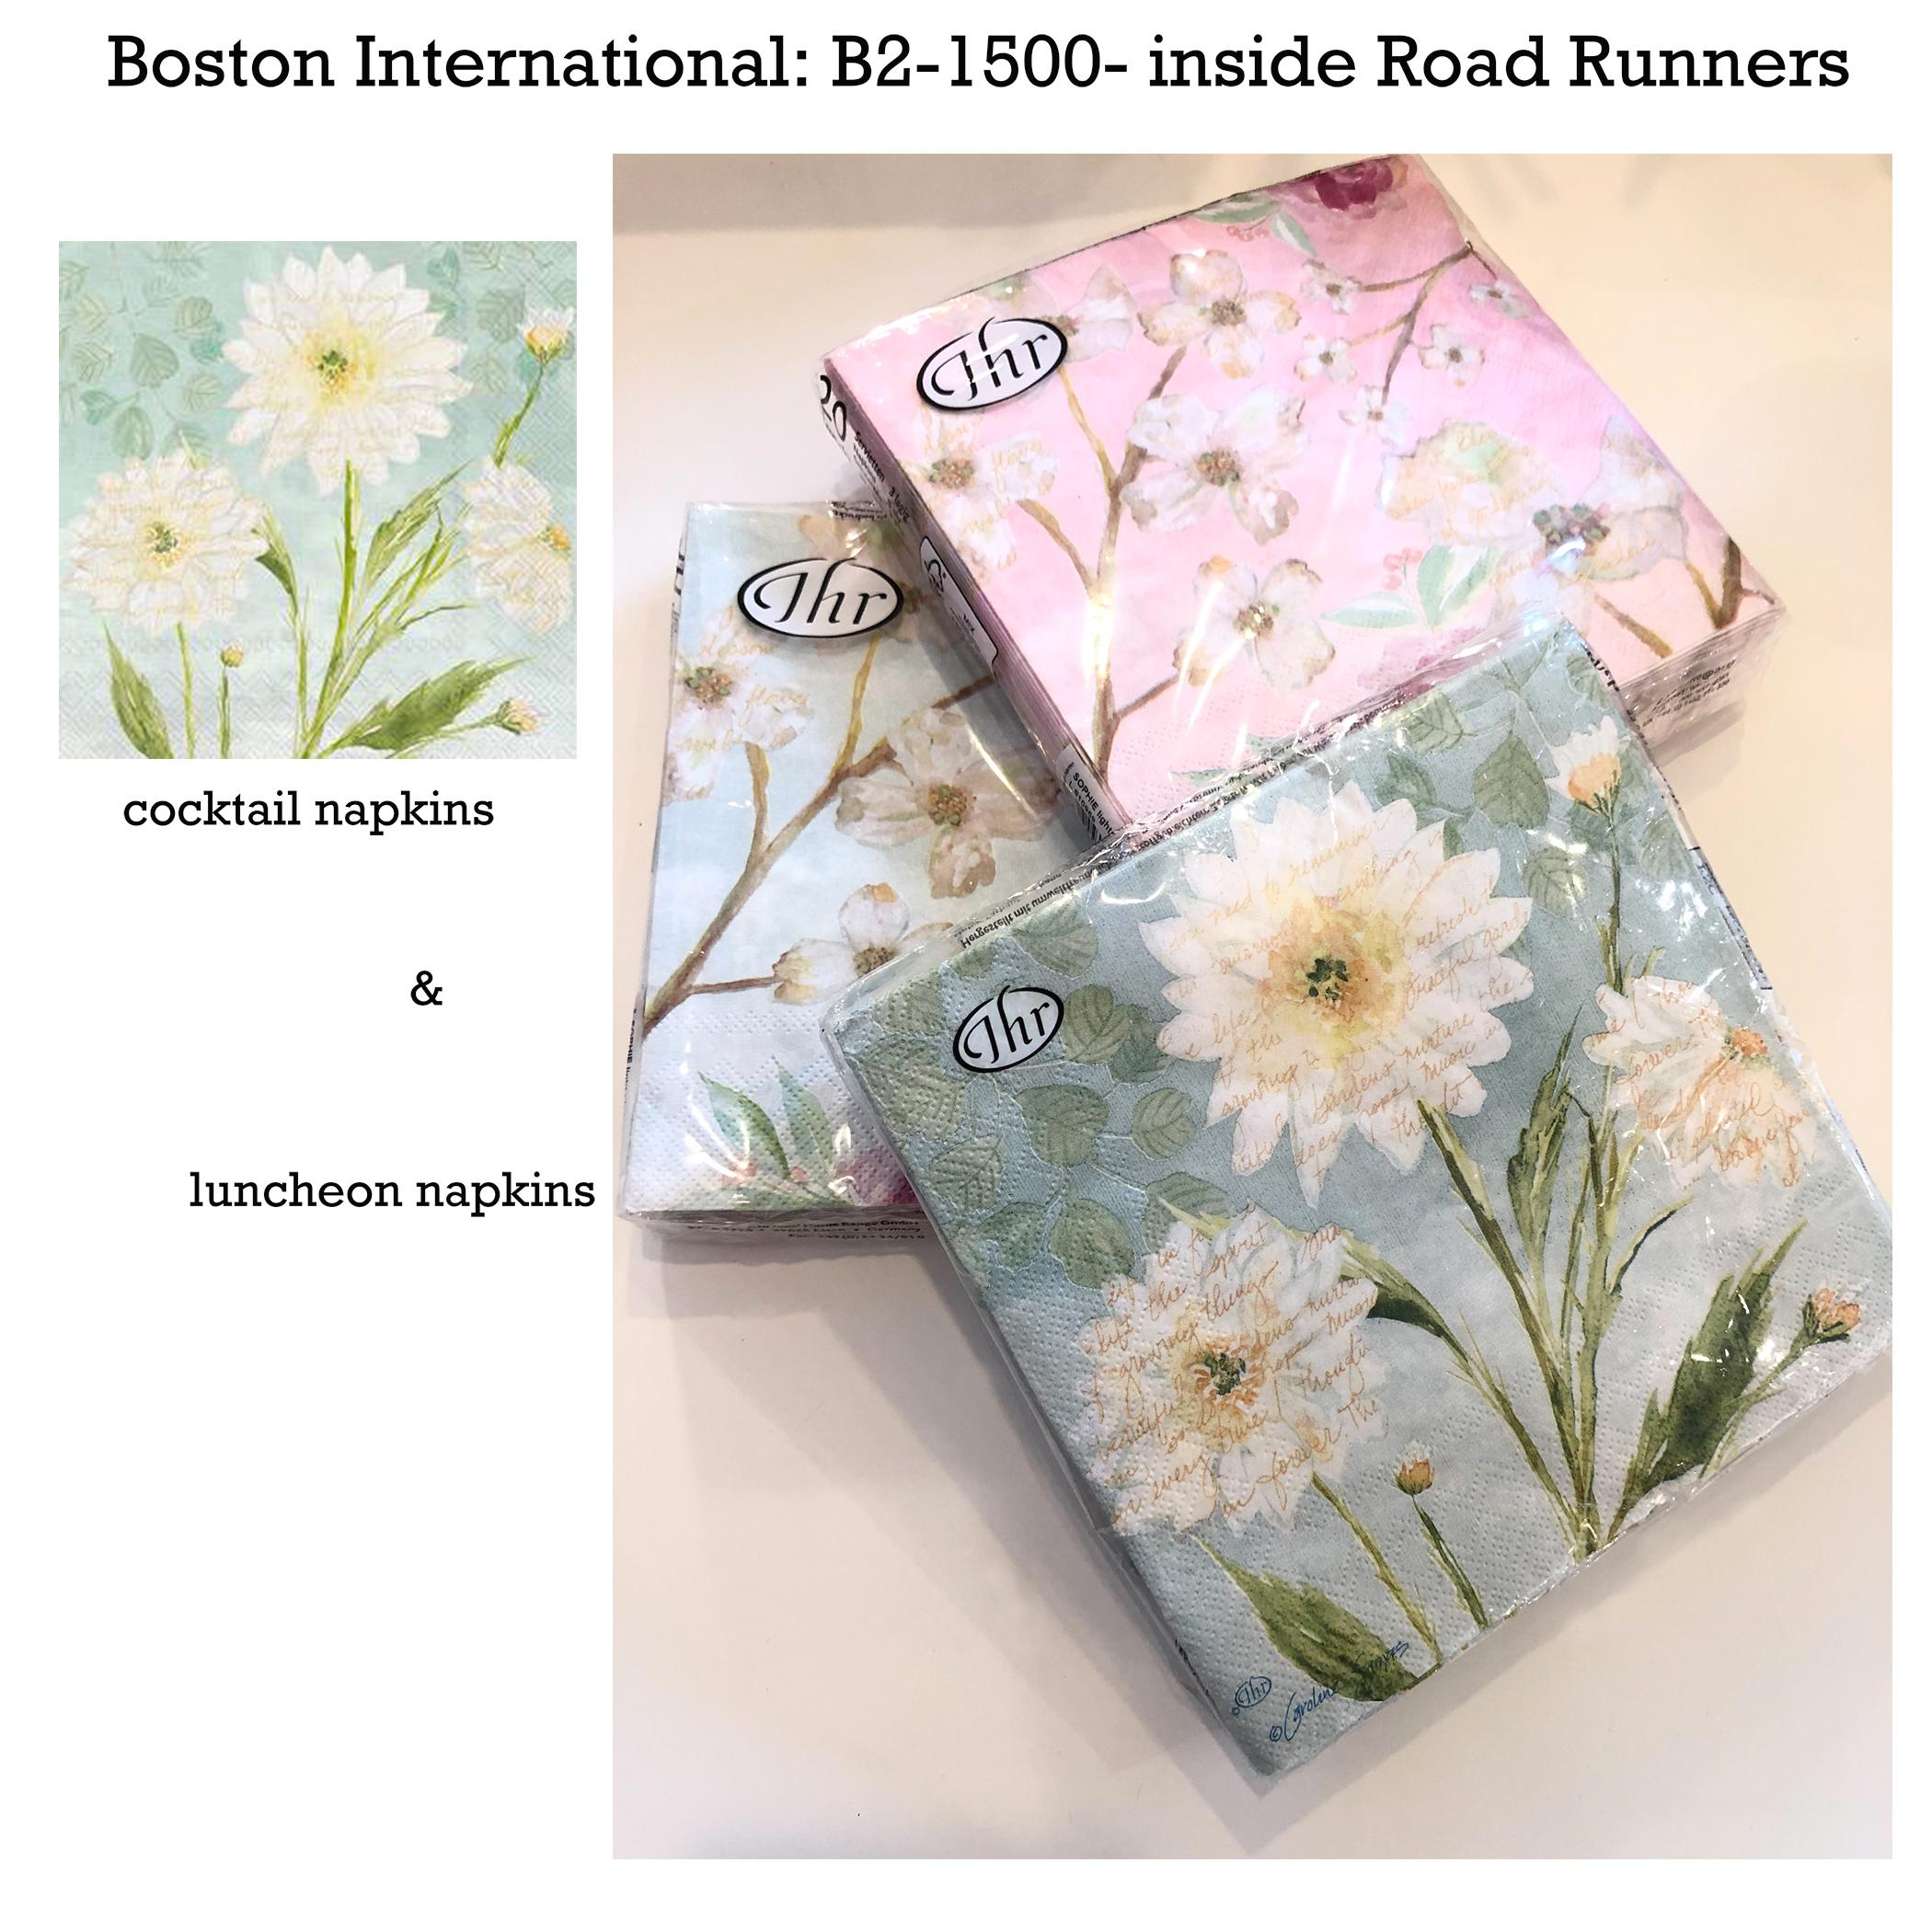 BostonInternational.jpg